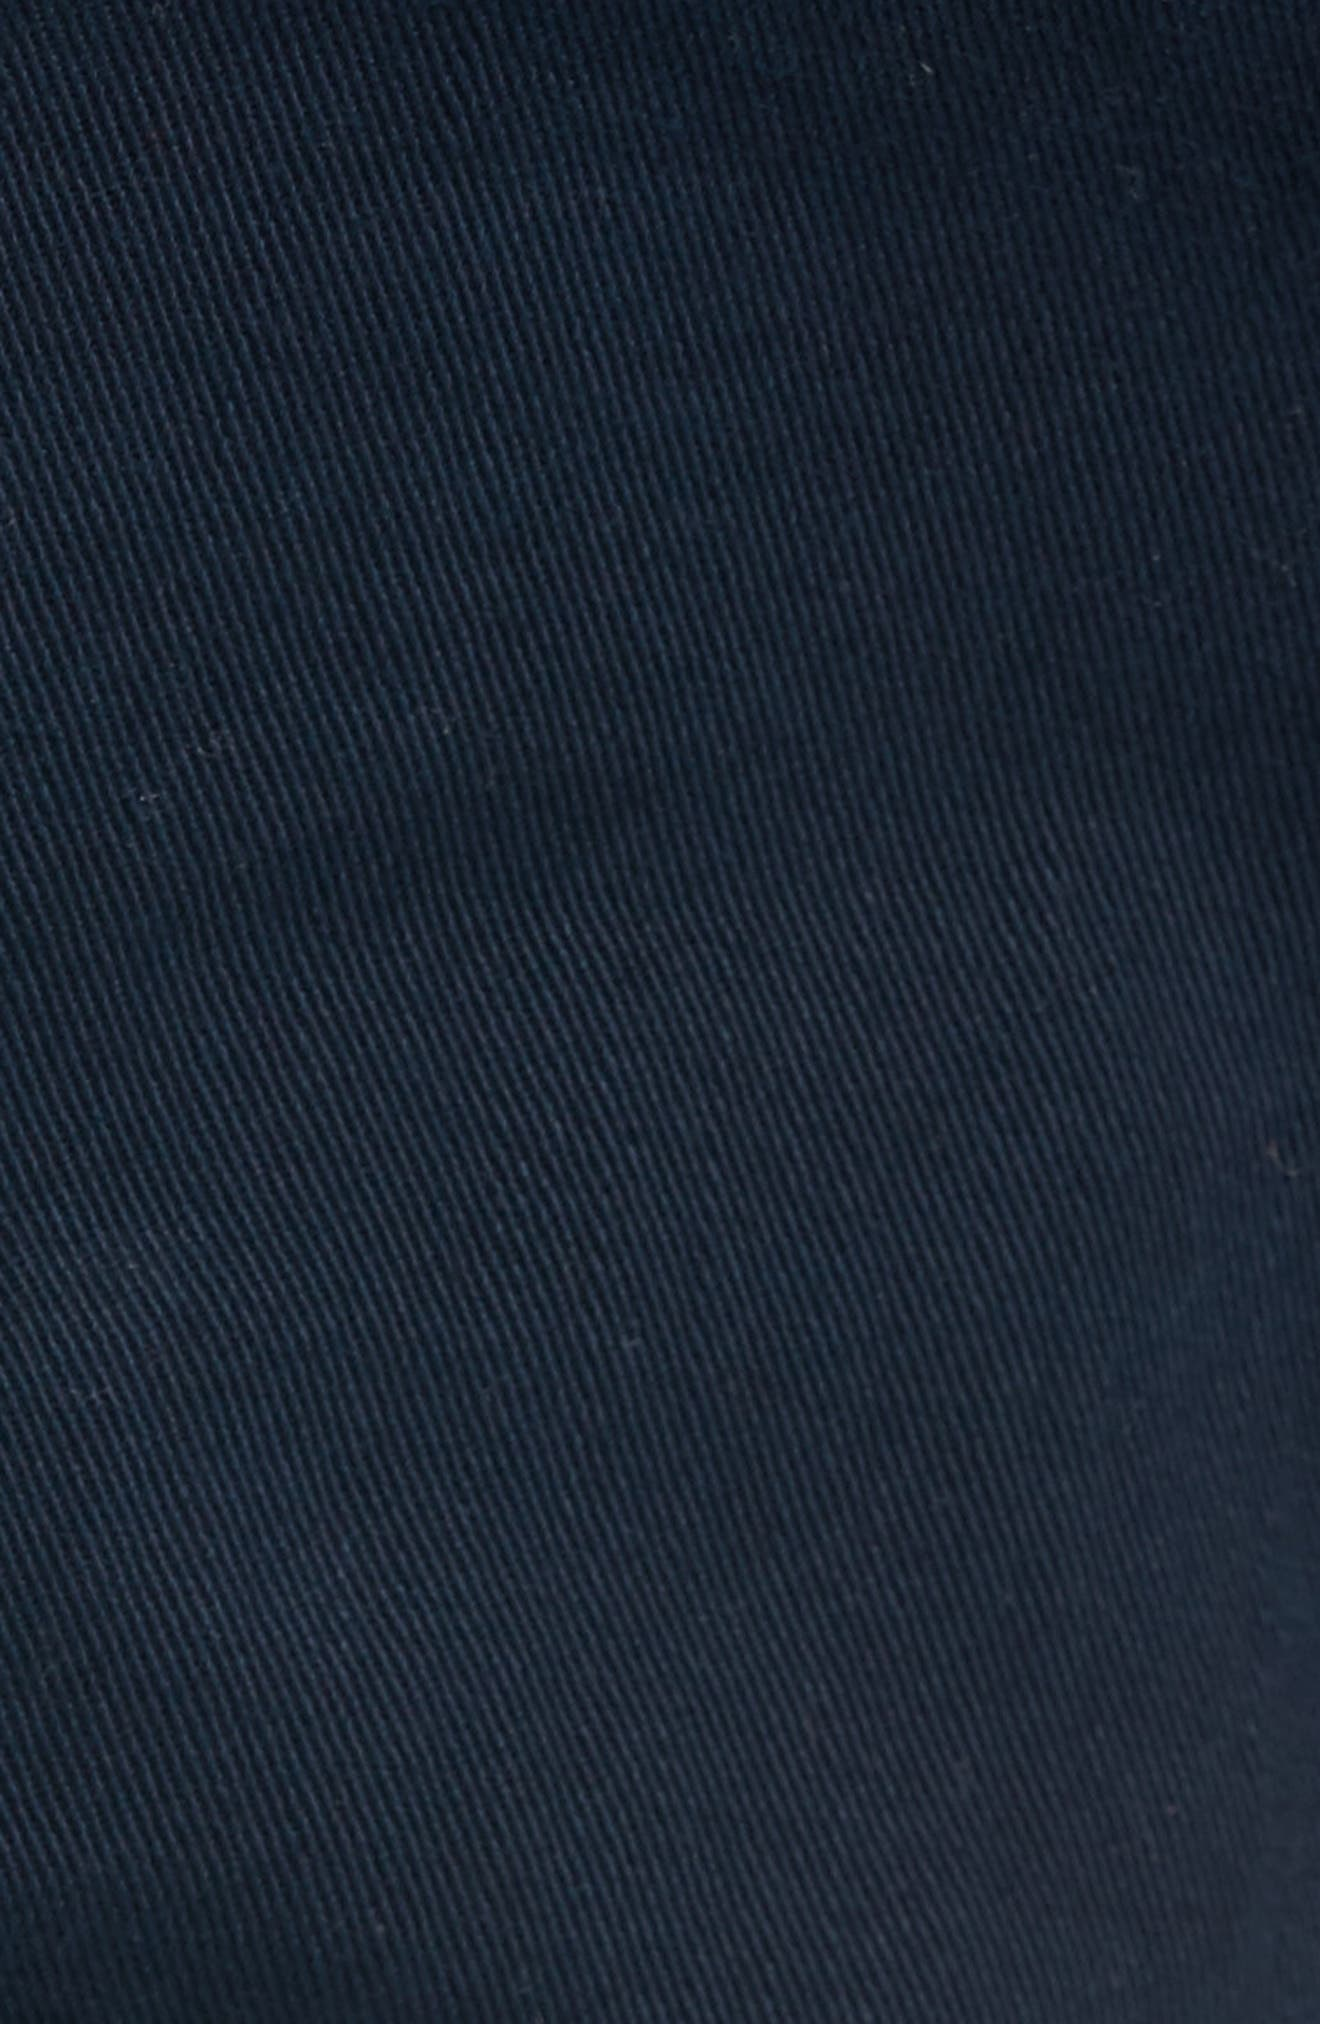 Greyson Cargo Biker Skinny Fit Jeans,                             Alternate thumbnail 5, color,                             Ink